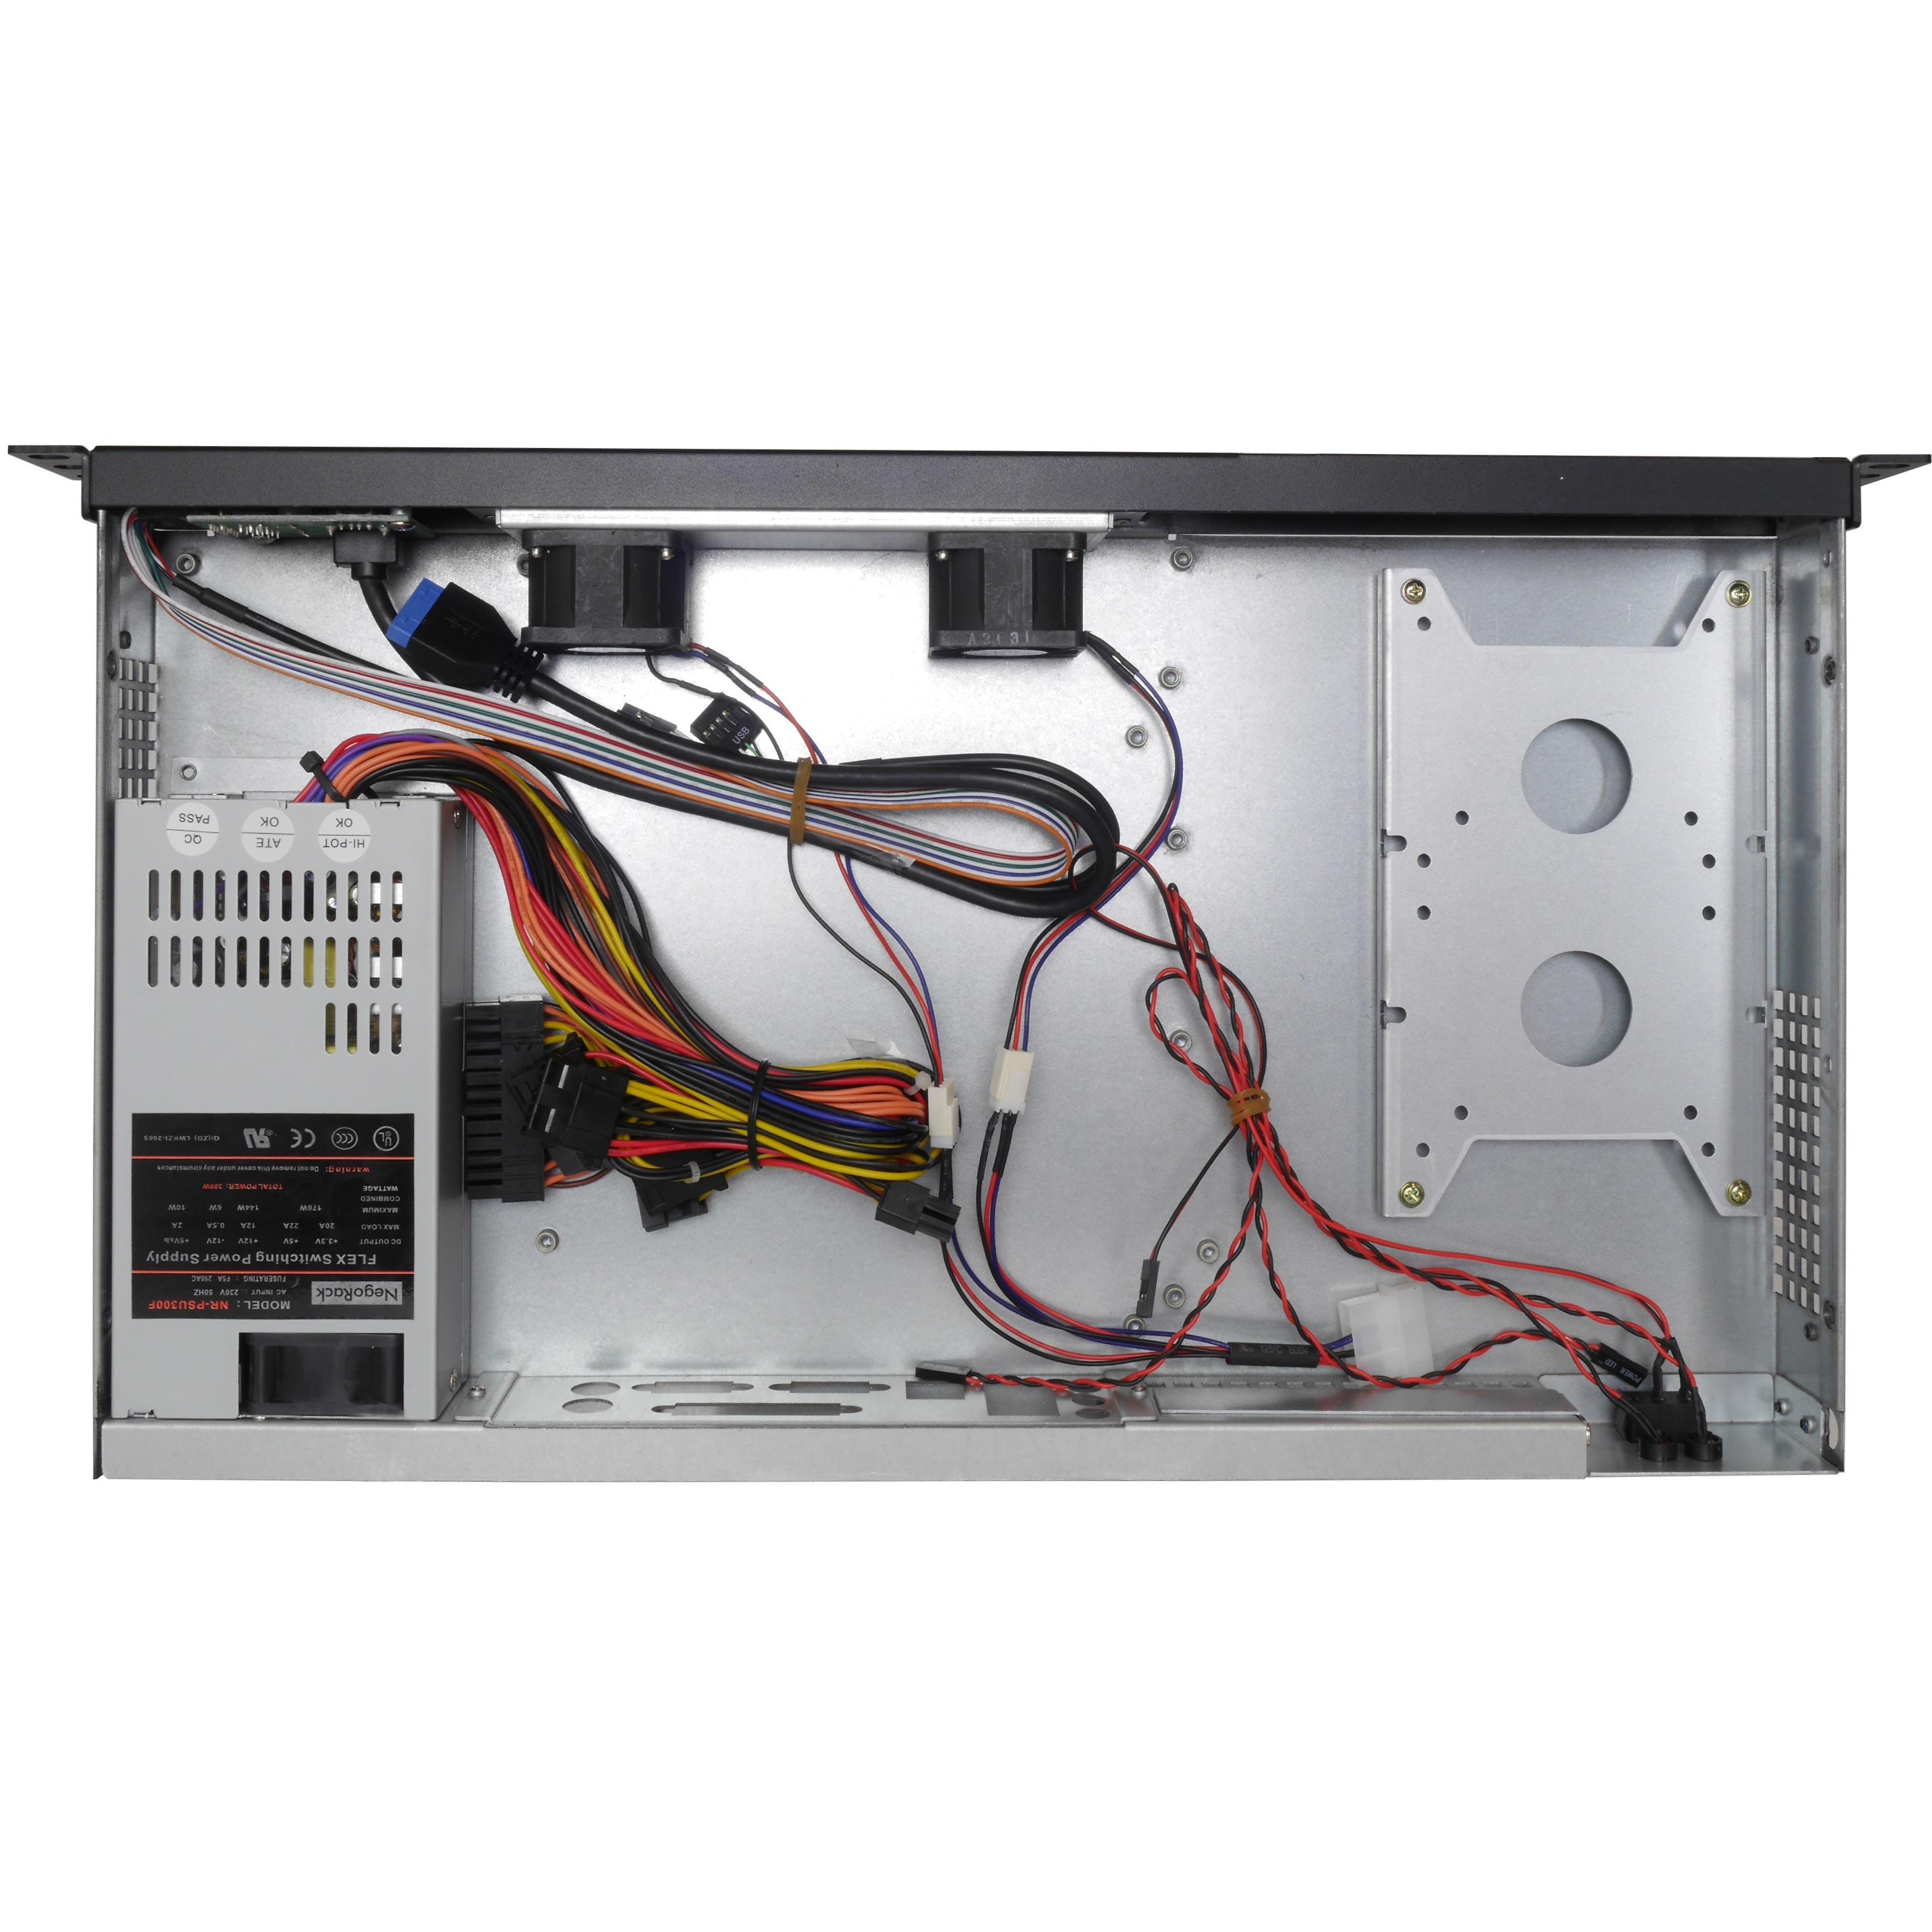 Серверный корпус 1U NR-N125CD 300Вт(MiniITX, 1x5.25 or 1x3.5int or 2x2.5int, 250mm) черный, NegoRack